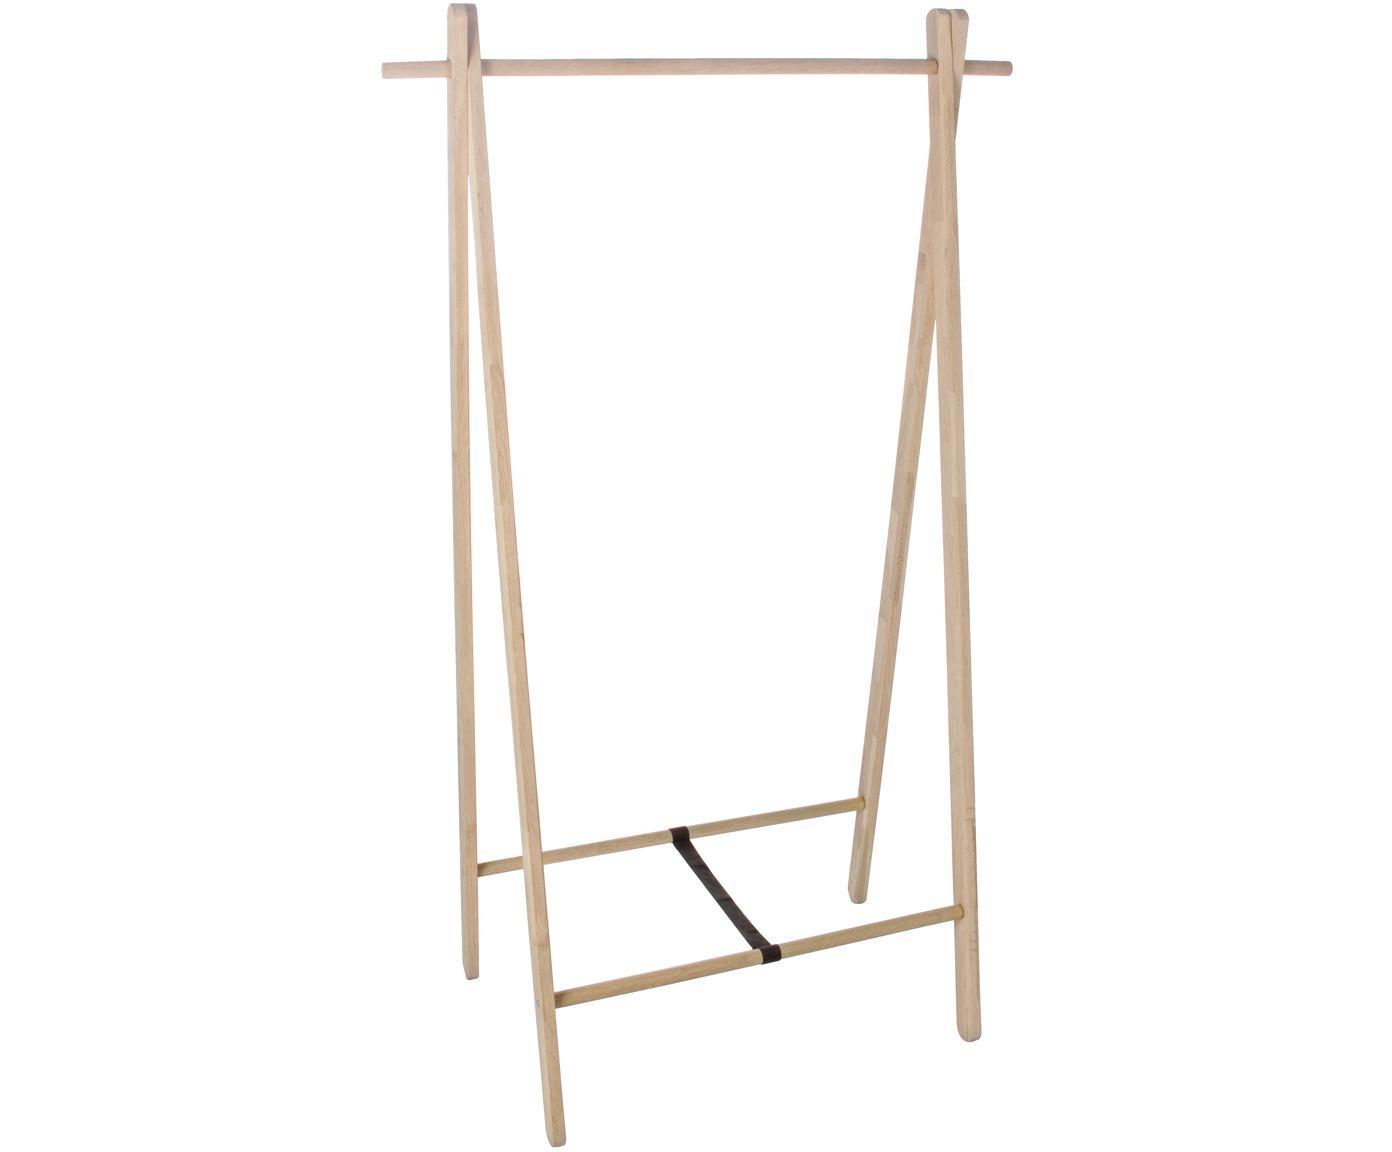 Garderobe Stand van eikenhout, Eikenhout, Bruin, 89 x 151 cm